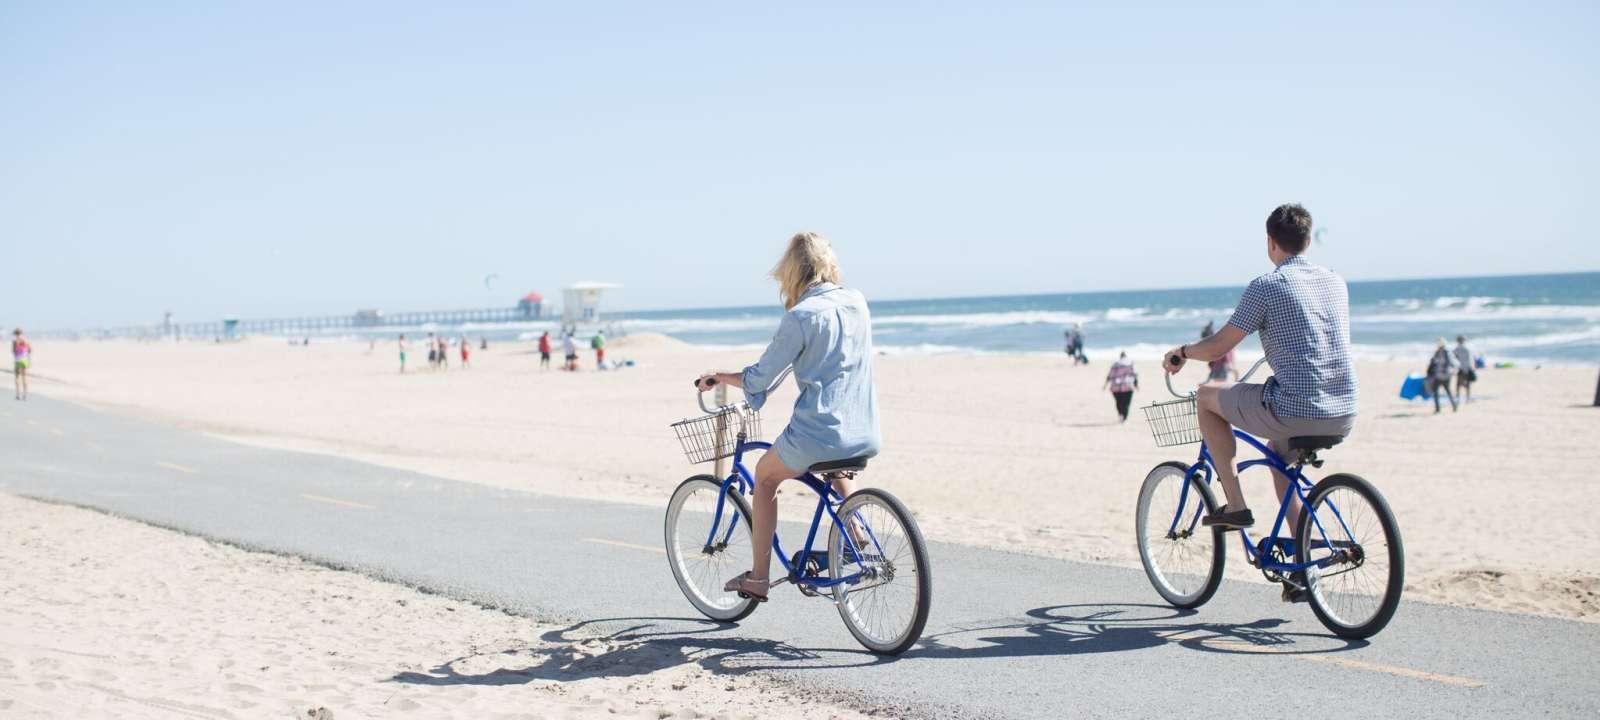 Huntington Beach Cycling Things to Do in Huntington Beach